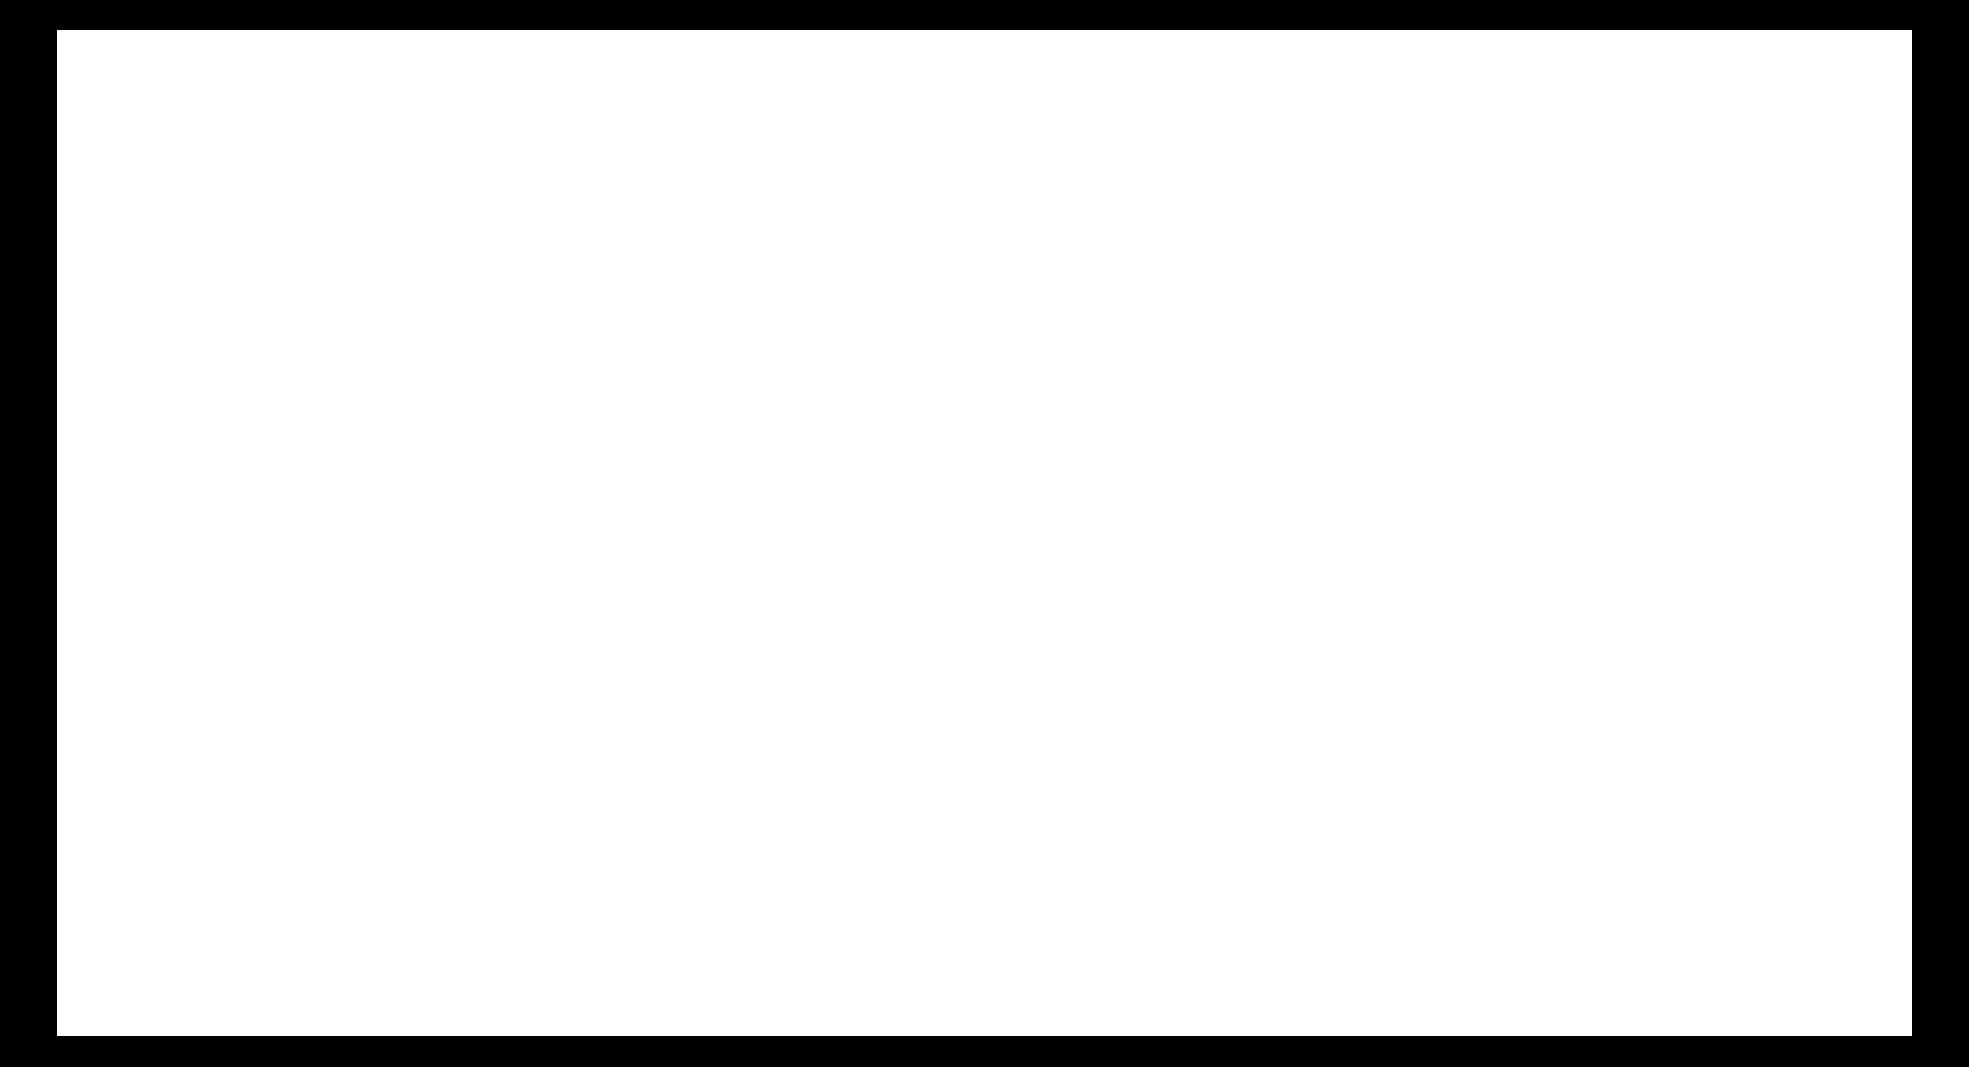 Award_INNY2010.png